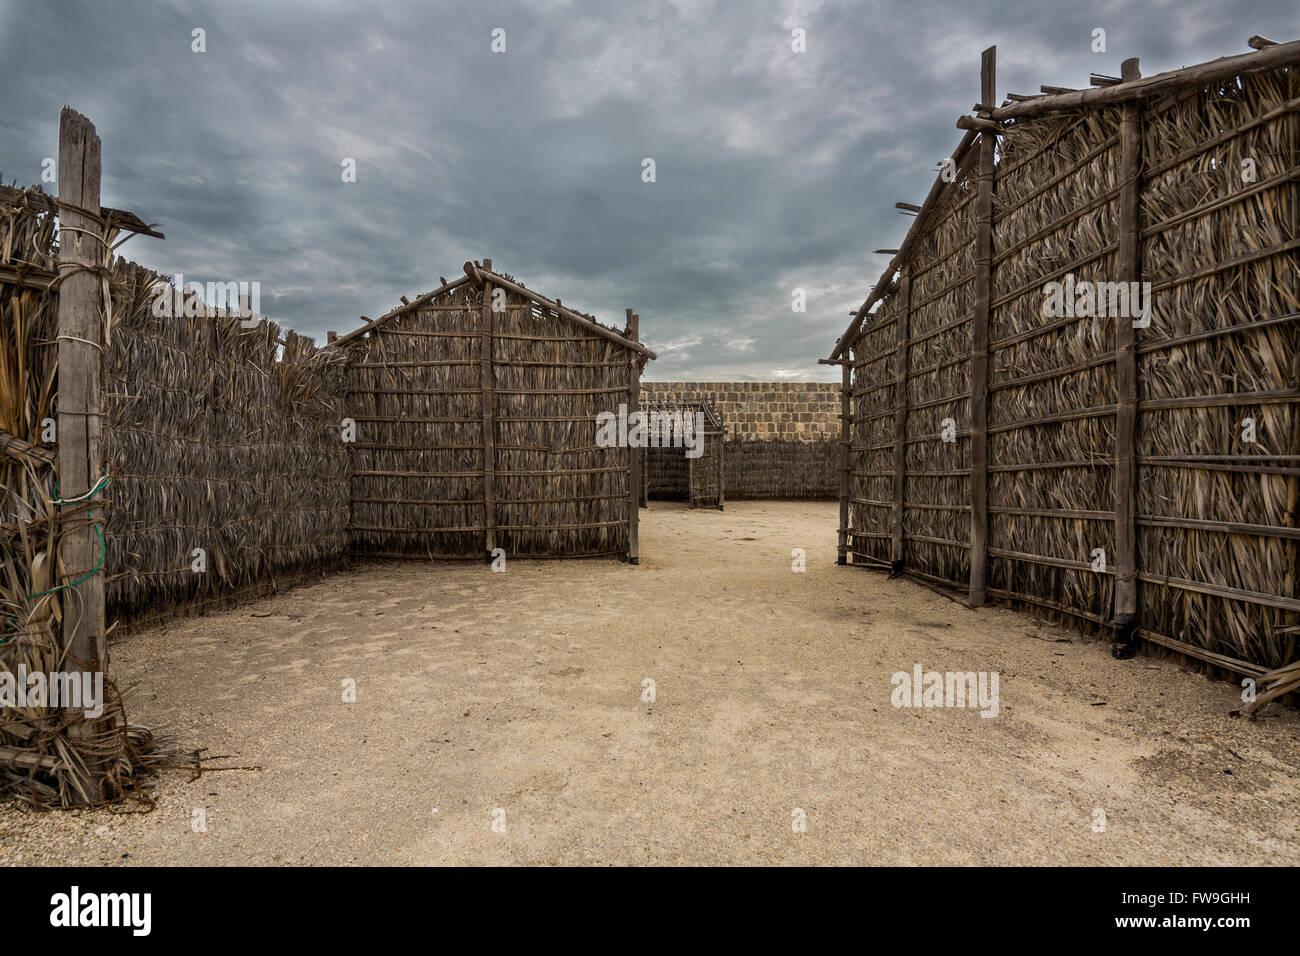 Arish ou huttes Barasti, Qal'at al-Bahreïn, aussi connu sous le Fort de Bahreïn Photo Stock